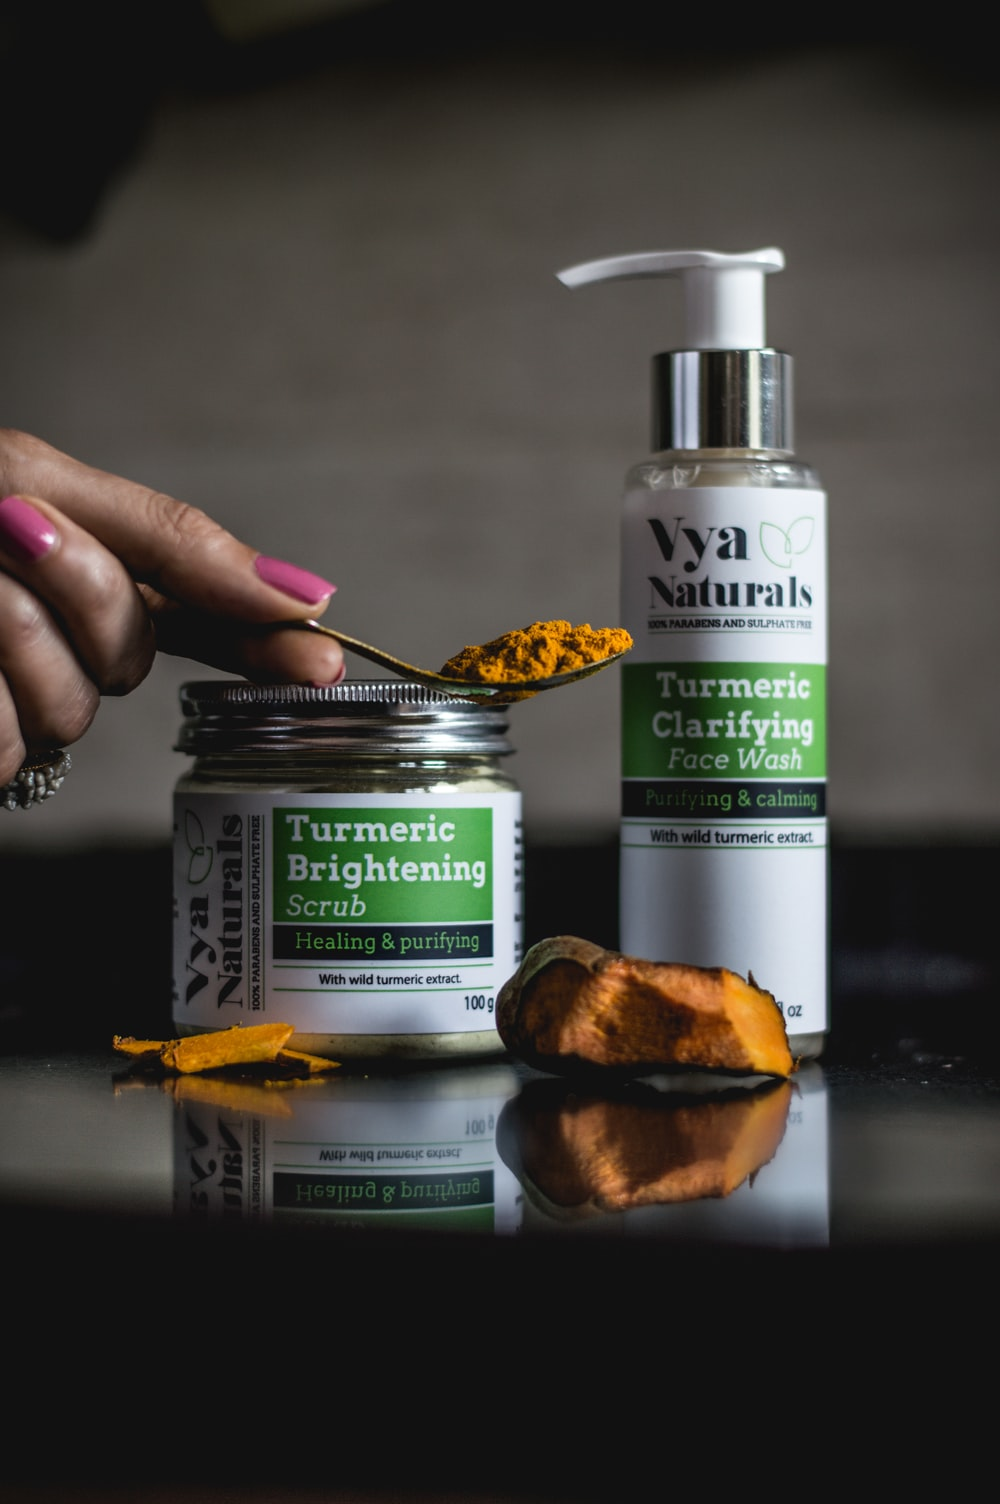 turmeric scrub jar and face wash pump bottle